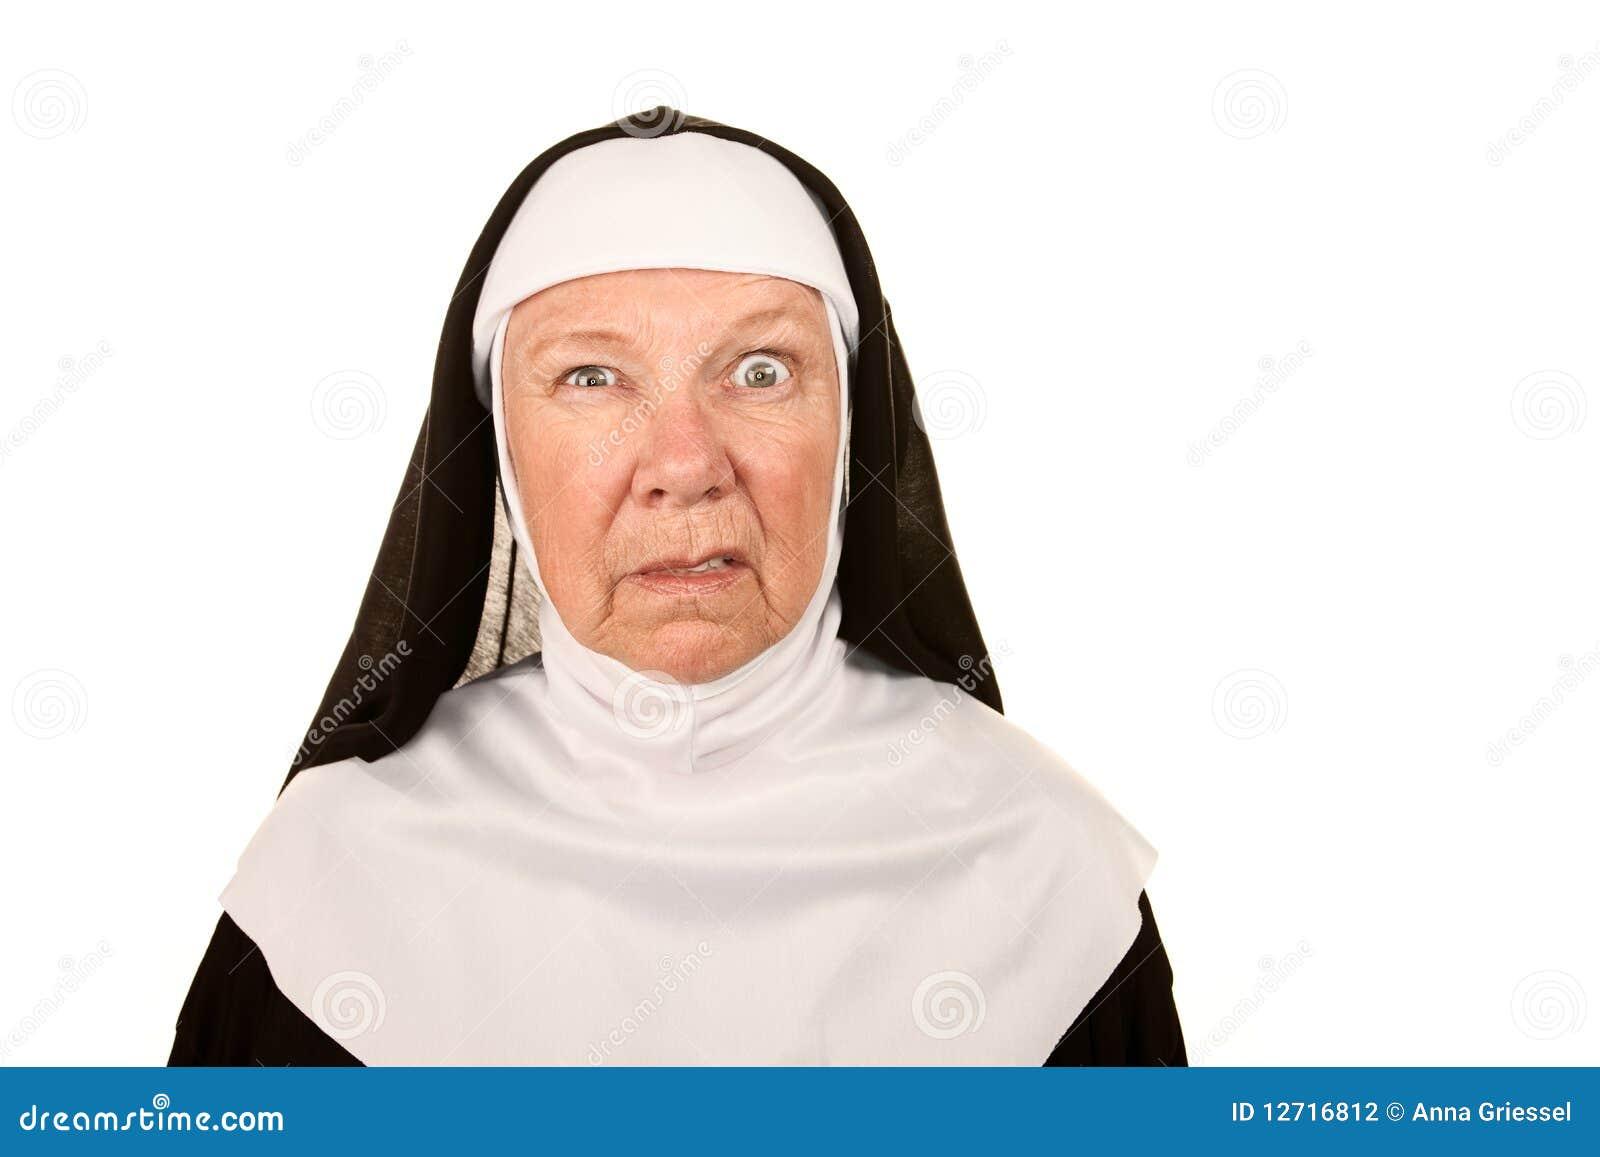 Funny Nun Stock Photography - Image: 12716812